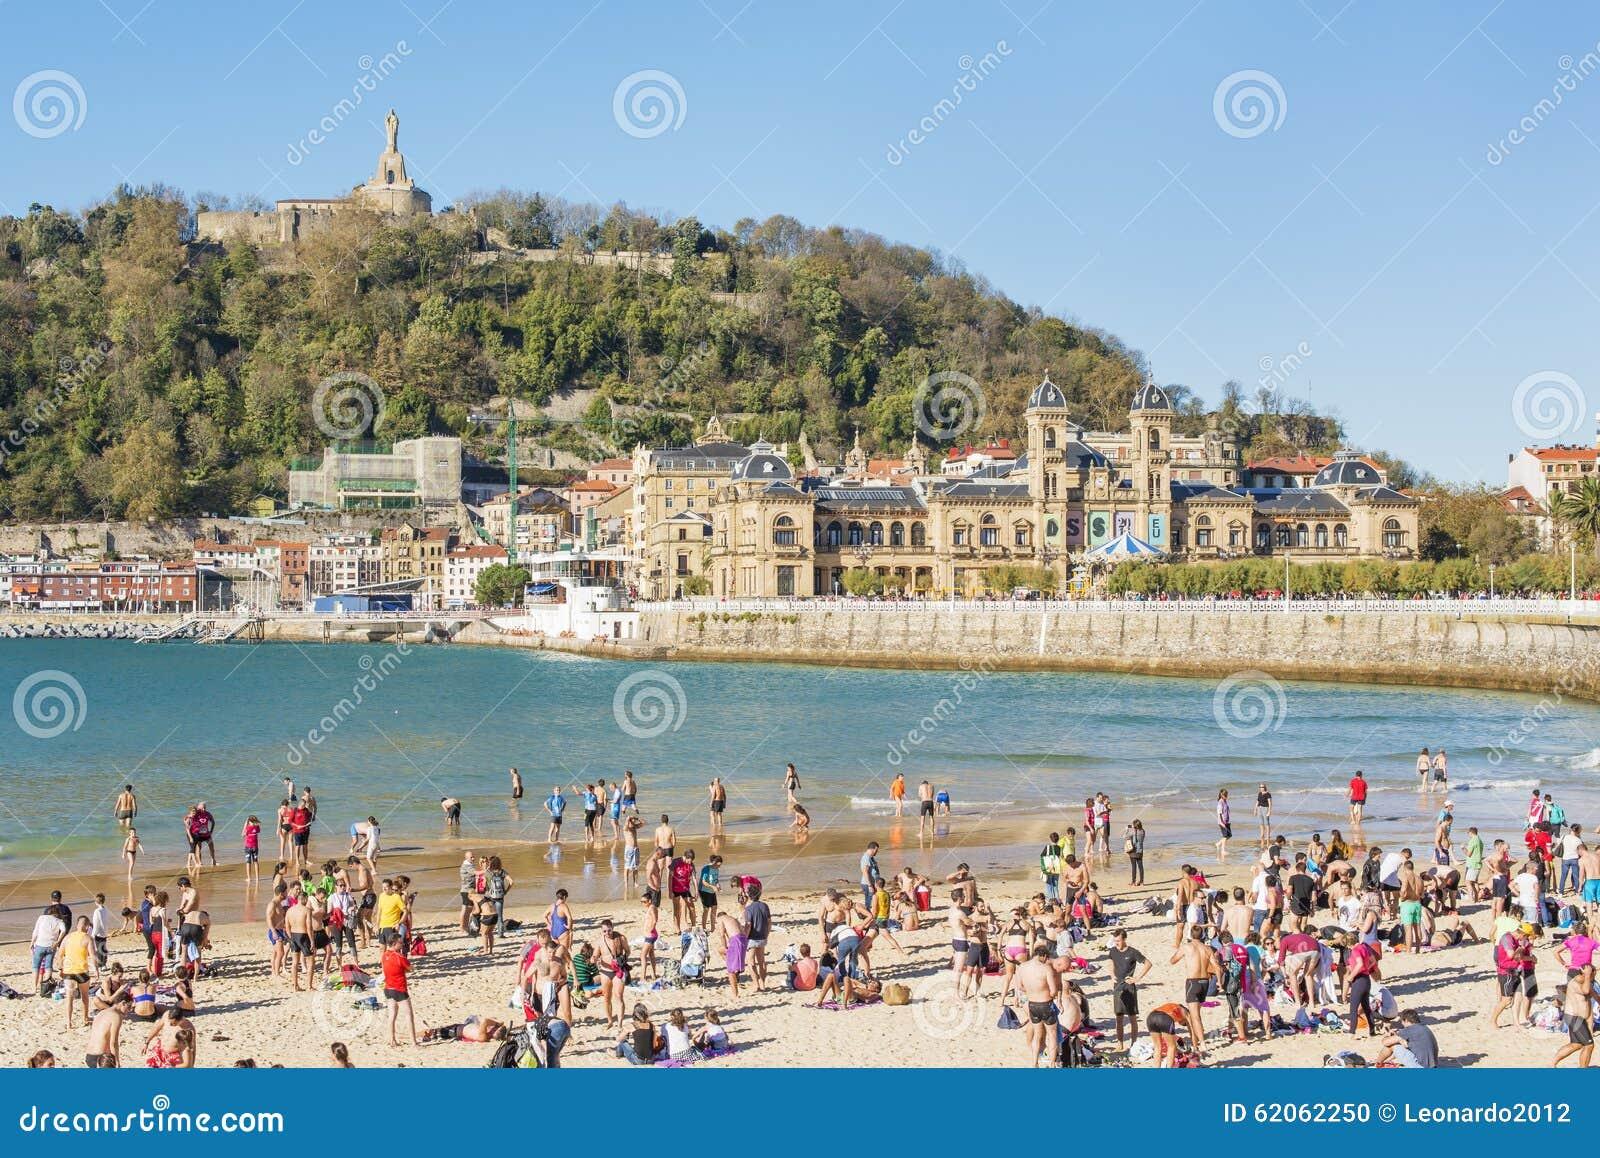 Download San Sebastian, Donostia, Gipuzkoa, Basque Country, Spain-Novembe Editorial Image - Image of guipuzkoa, people: 62062250